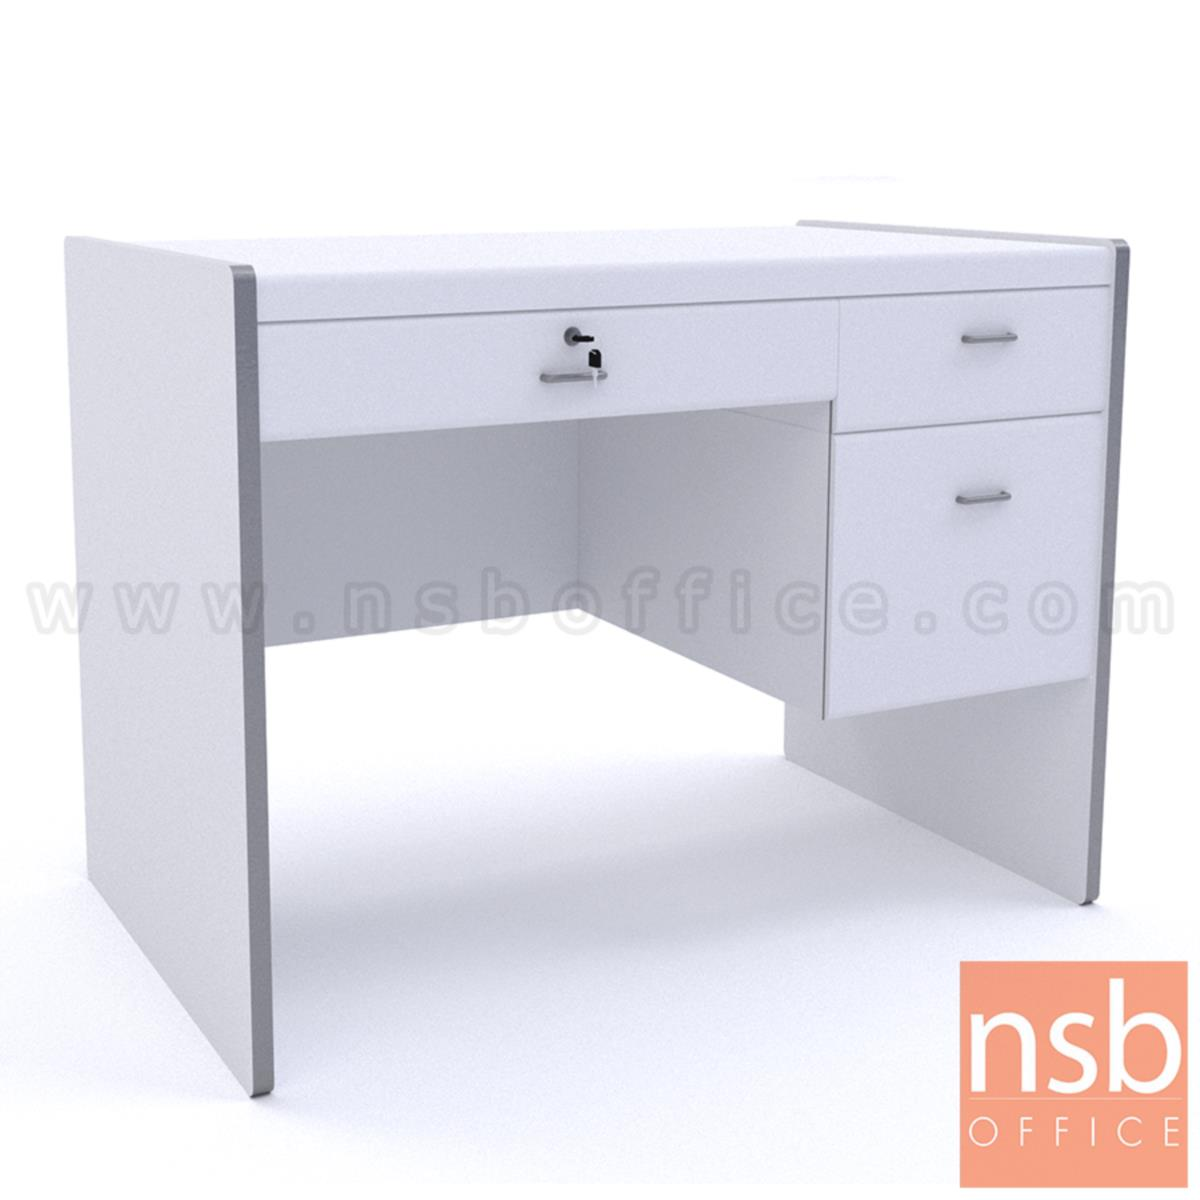 A01A006:โต๊ะทำงาน 3 ลิ้นชัก รุ่น Aly (อัลลี) ขนาด 100W ,120W cm.